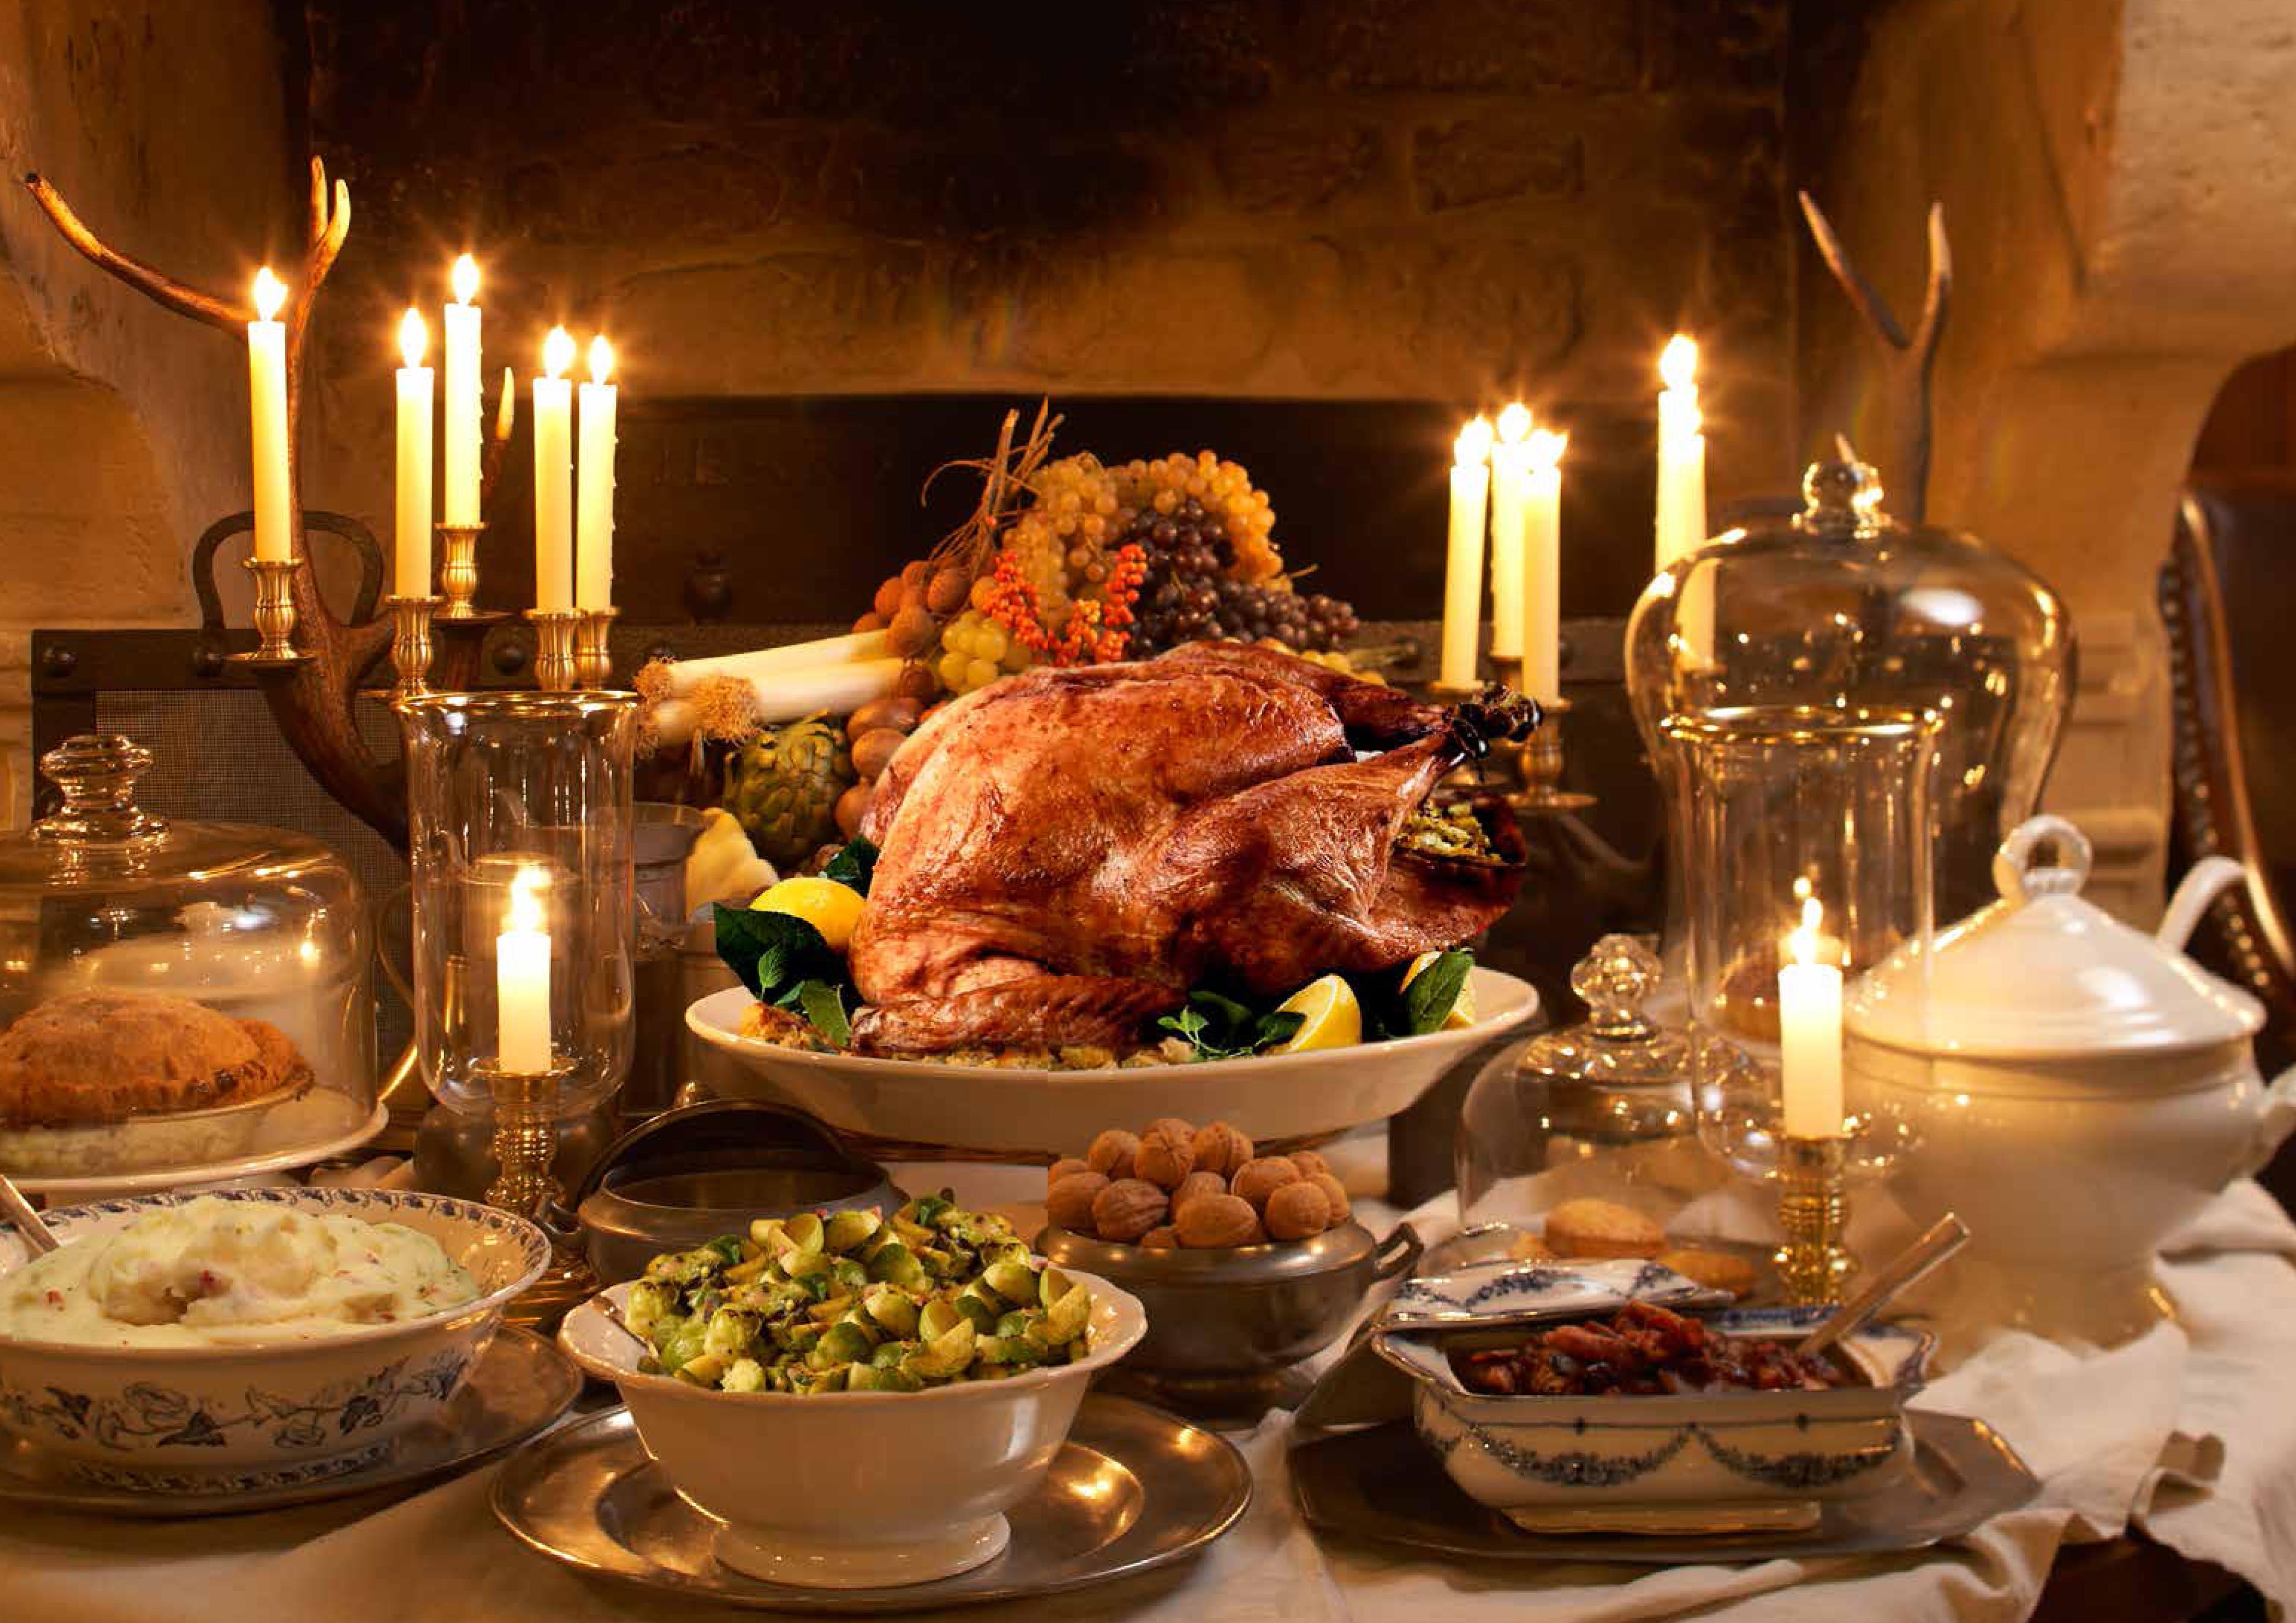 ralphs_thanksgiving_at_ralphs.jpg